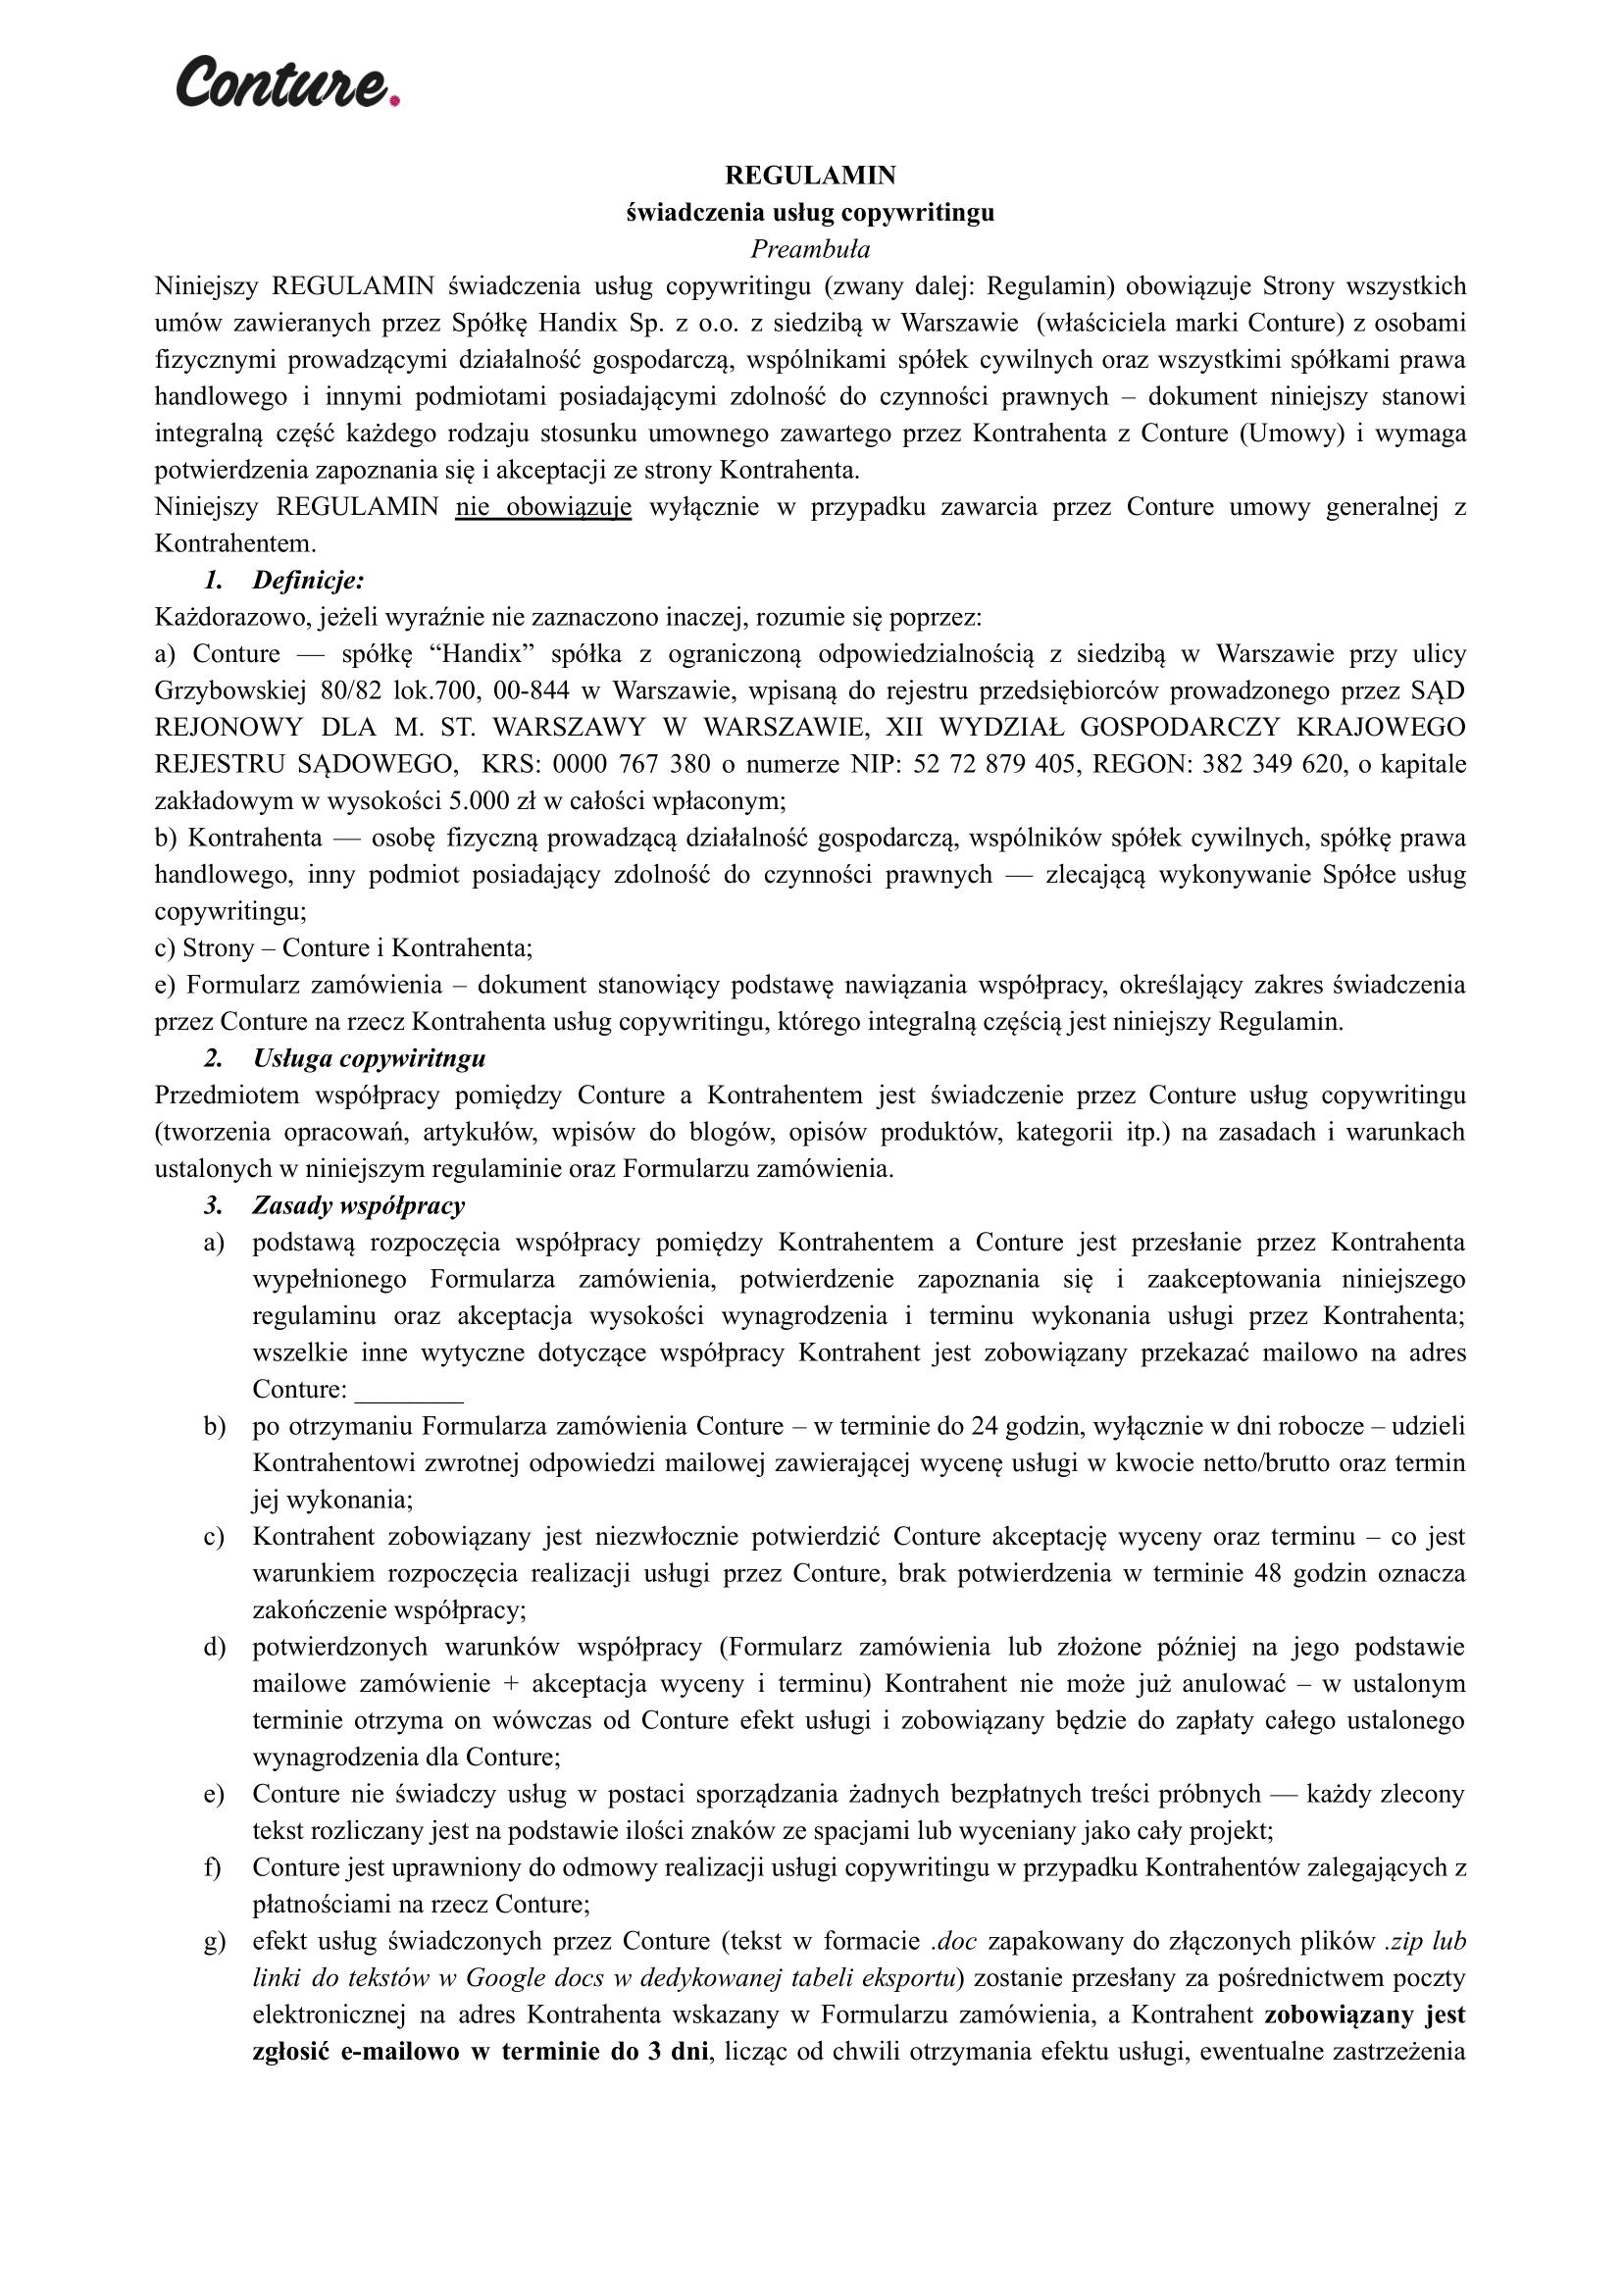 Regulamin Handix 1